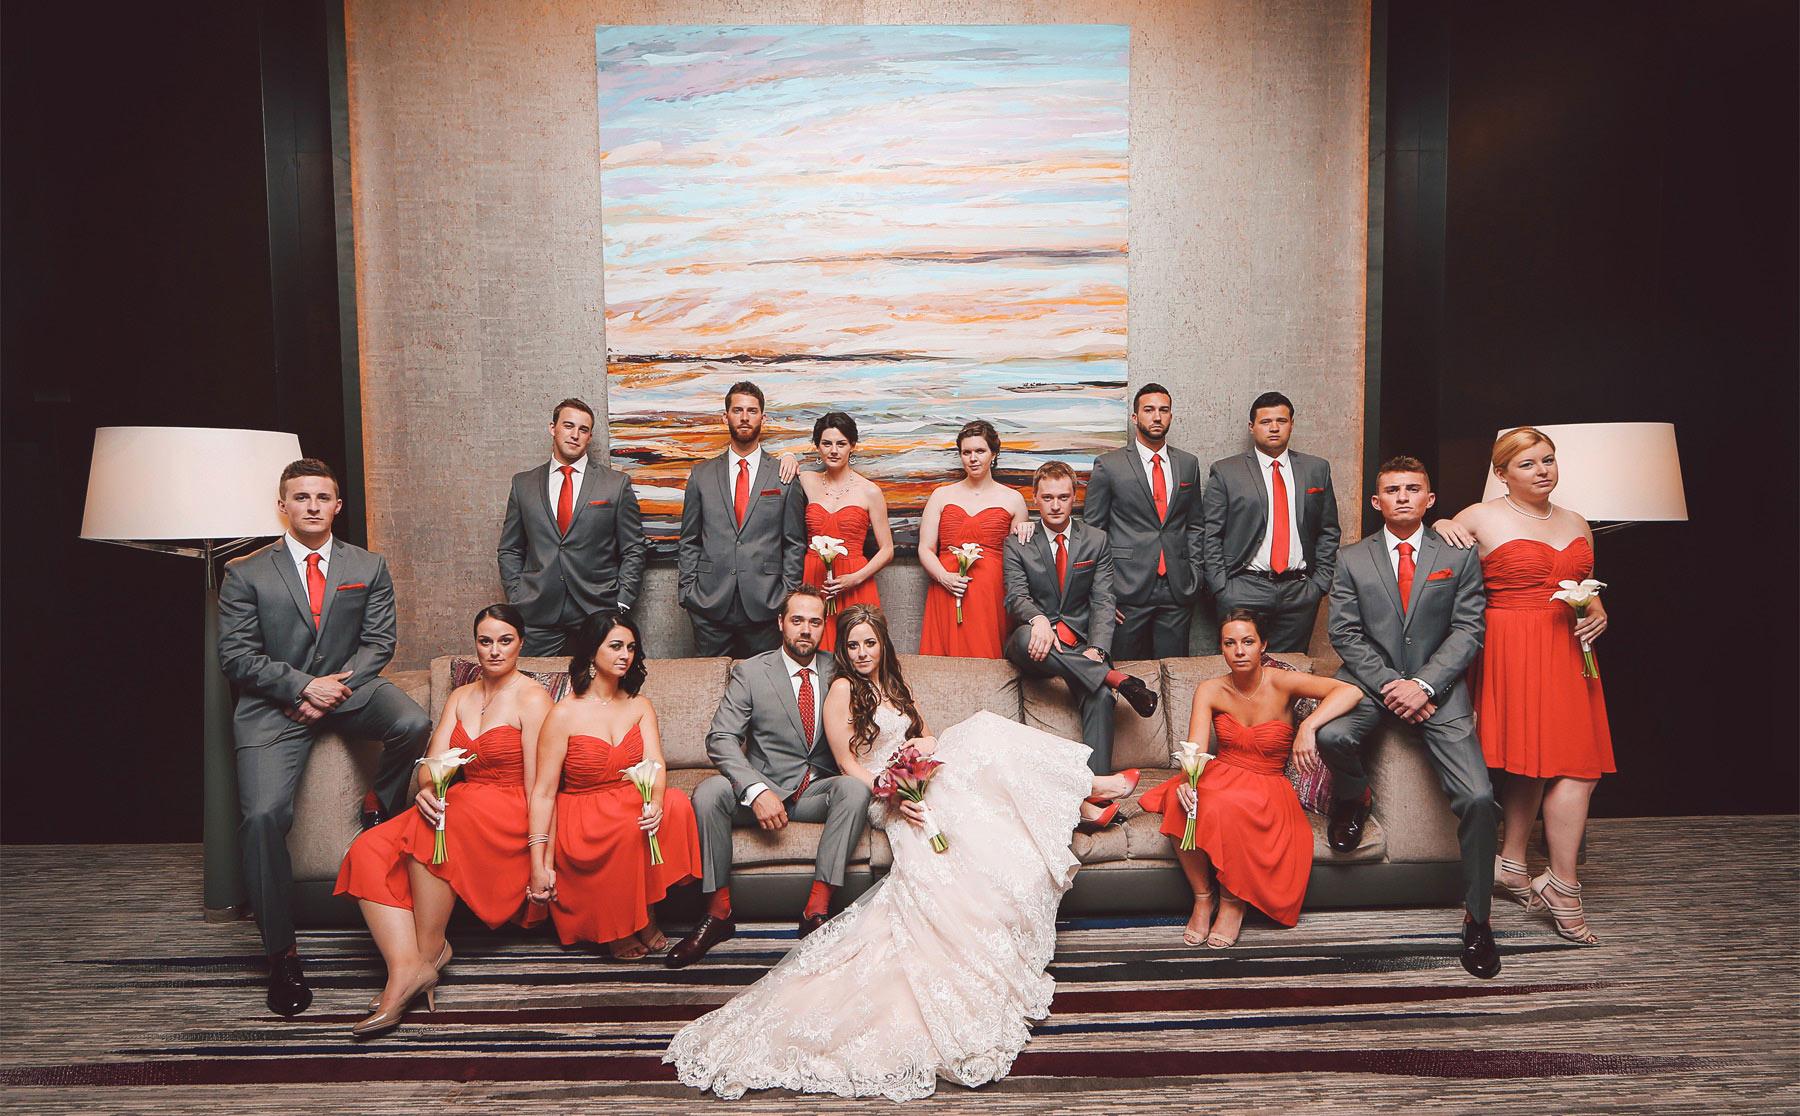 11-Minneapolis-Minnesota-Wedding-Photographer-by-Andrew-Vick-Photography-Summer-Edina-Westin-Hotel-Wedding-Party-Dress-Bridesmaids-Groomsmen-Bride-Groom-Natalie-and-Andrew.jpg